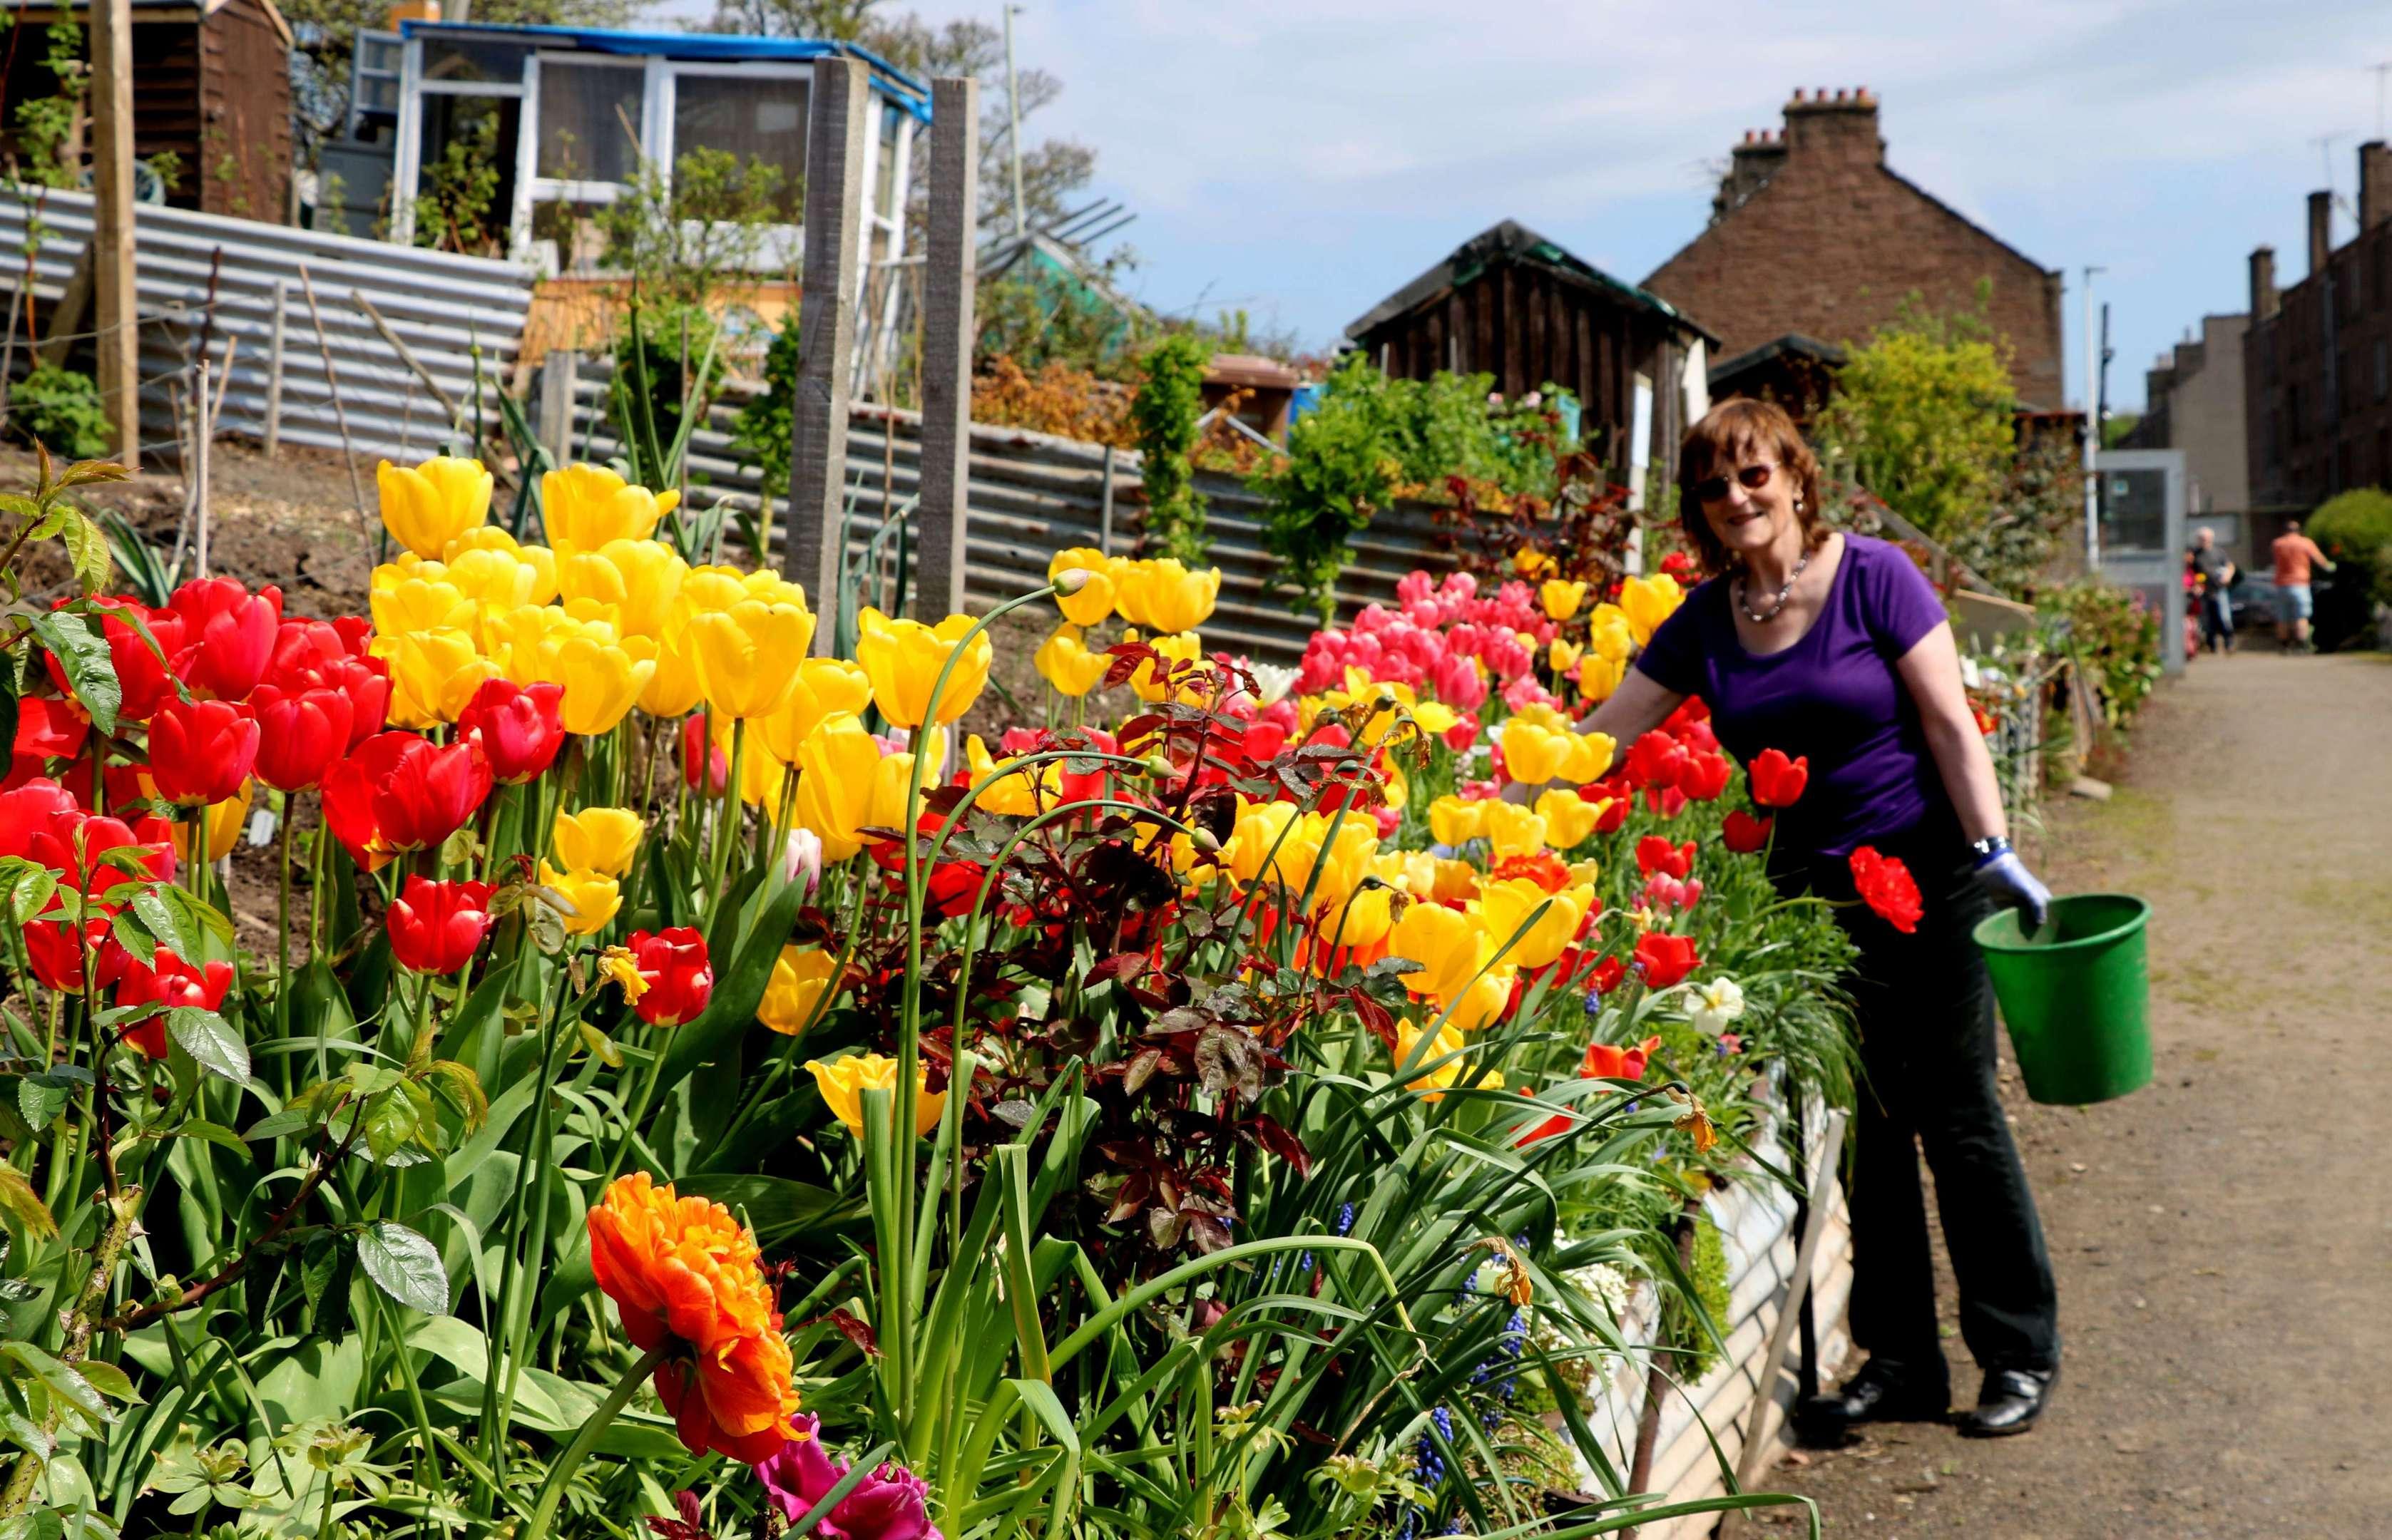 Anna weeding flower border at City Road allotments